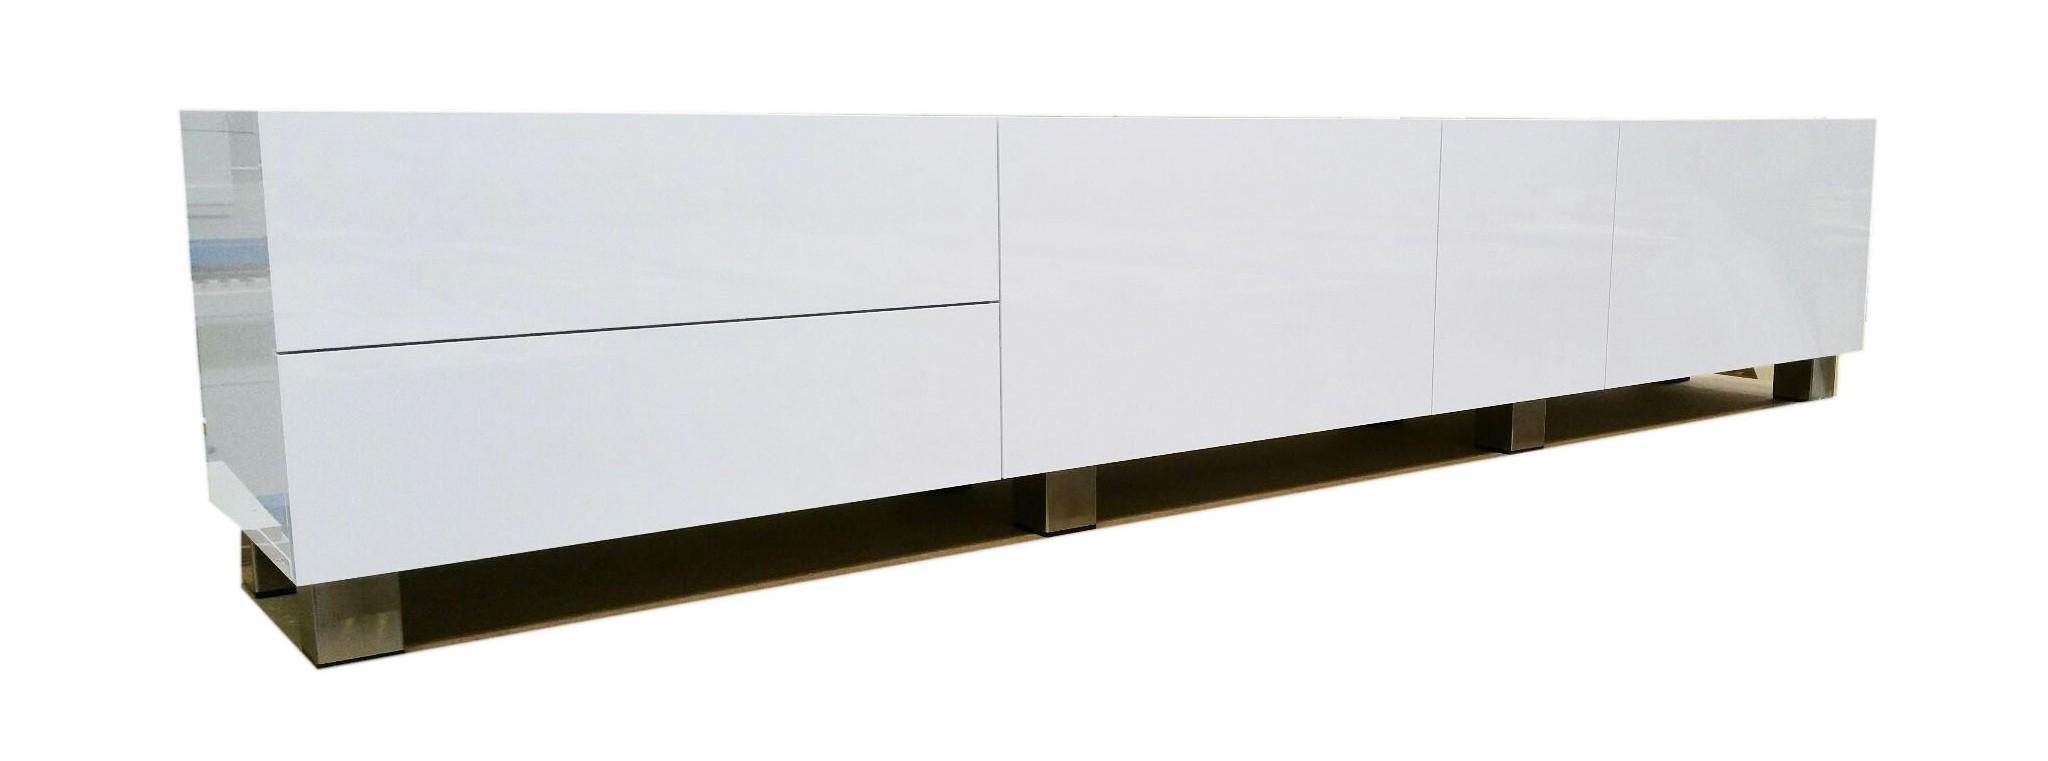 paris-white-gloss-tv-entertainment-unit-3.jpg